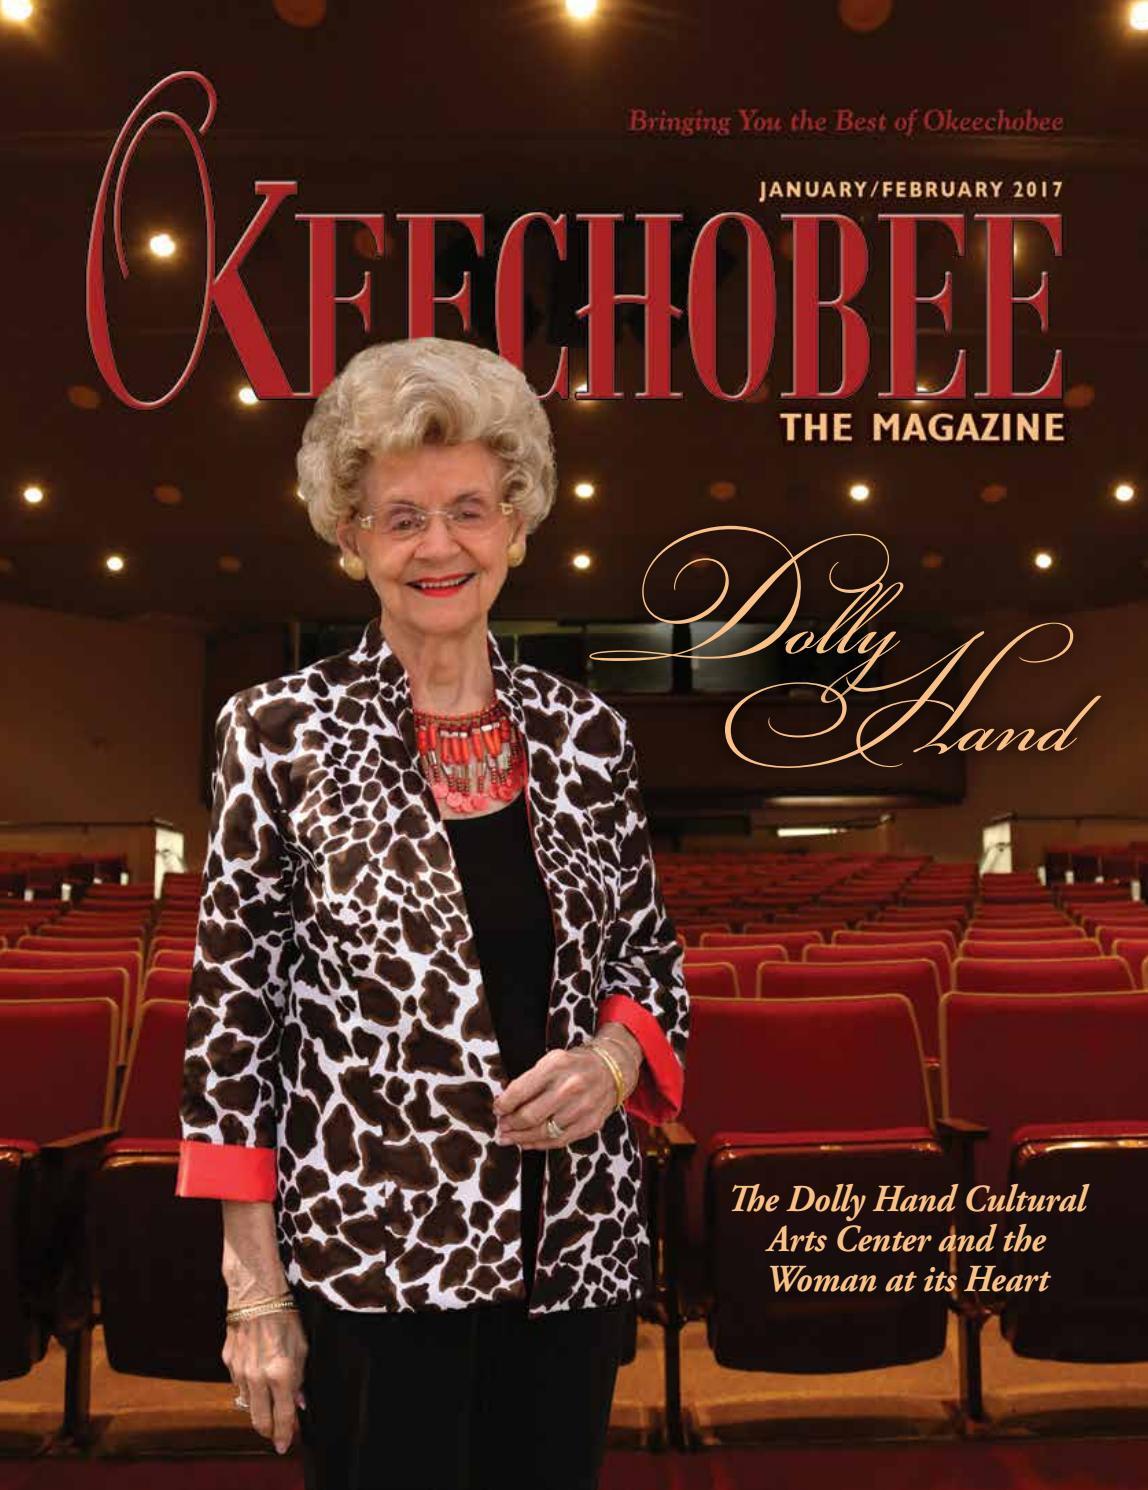 Okeechobee The Magazine Jan/Feb 2017 by Okeechobee The ...